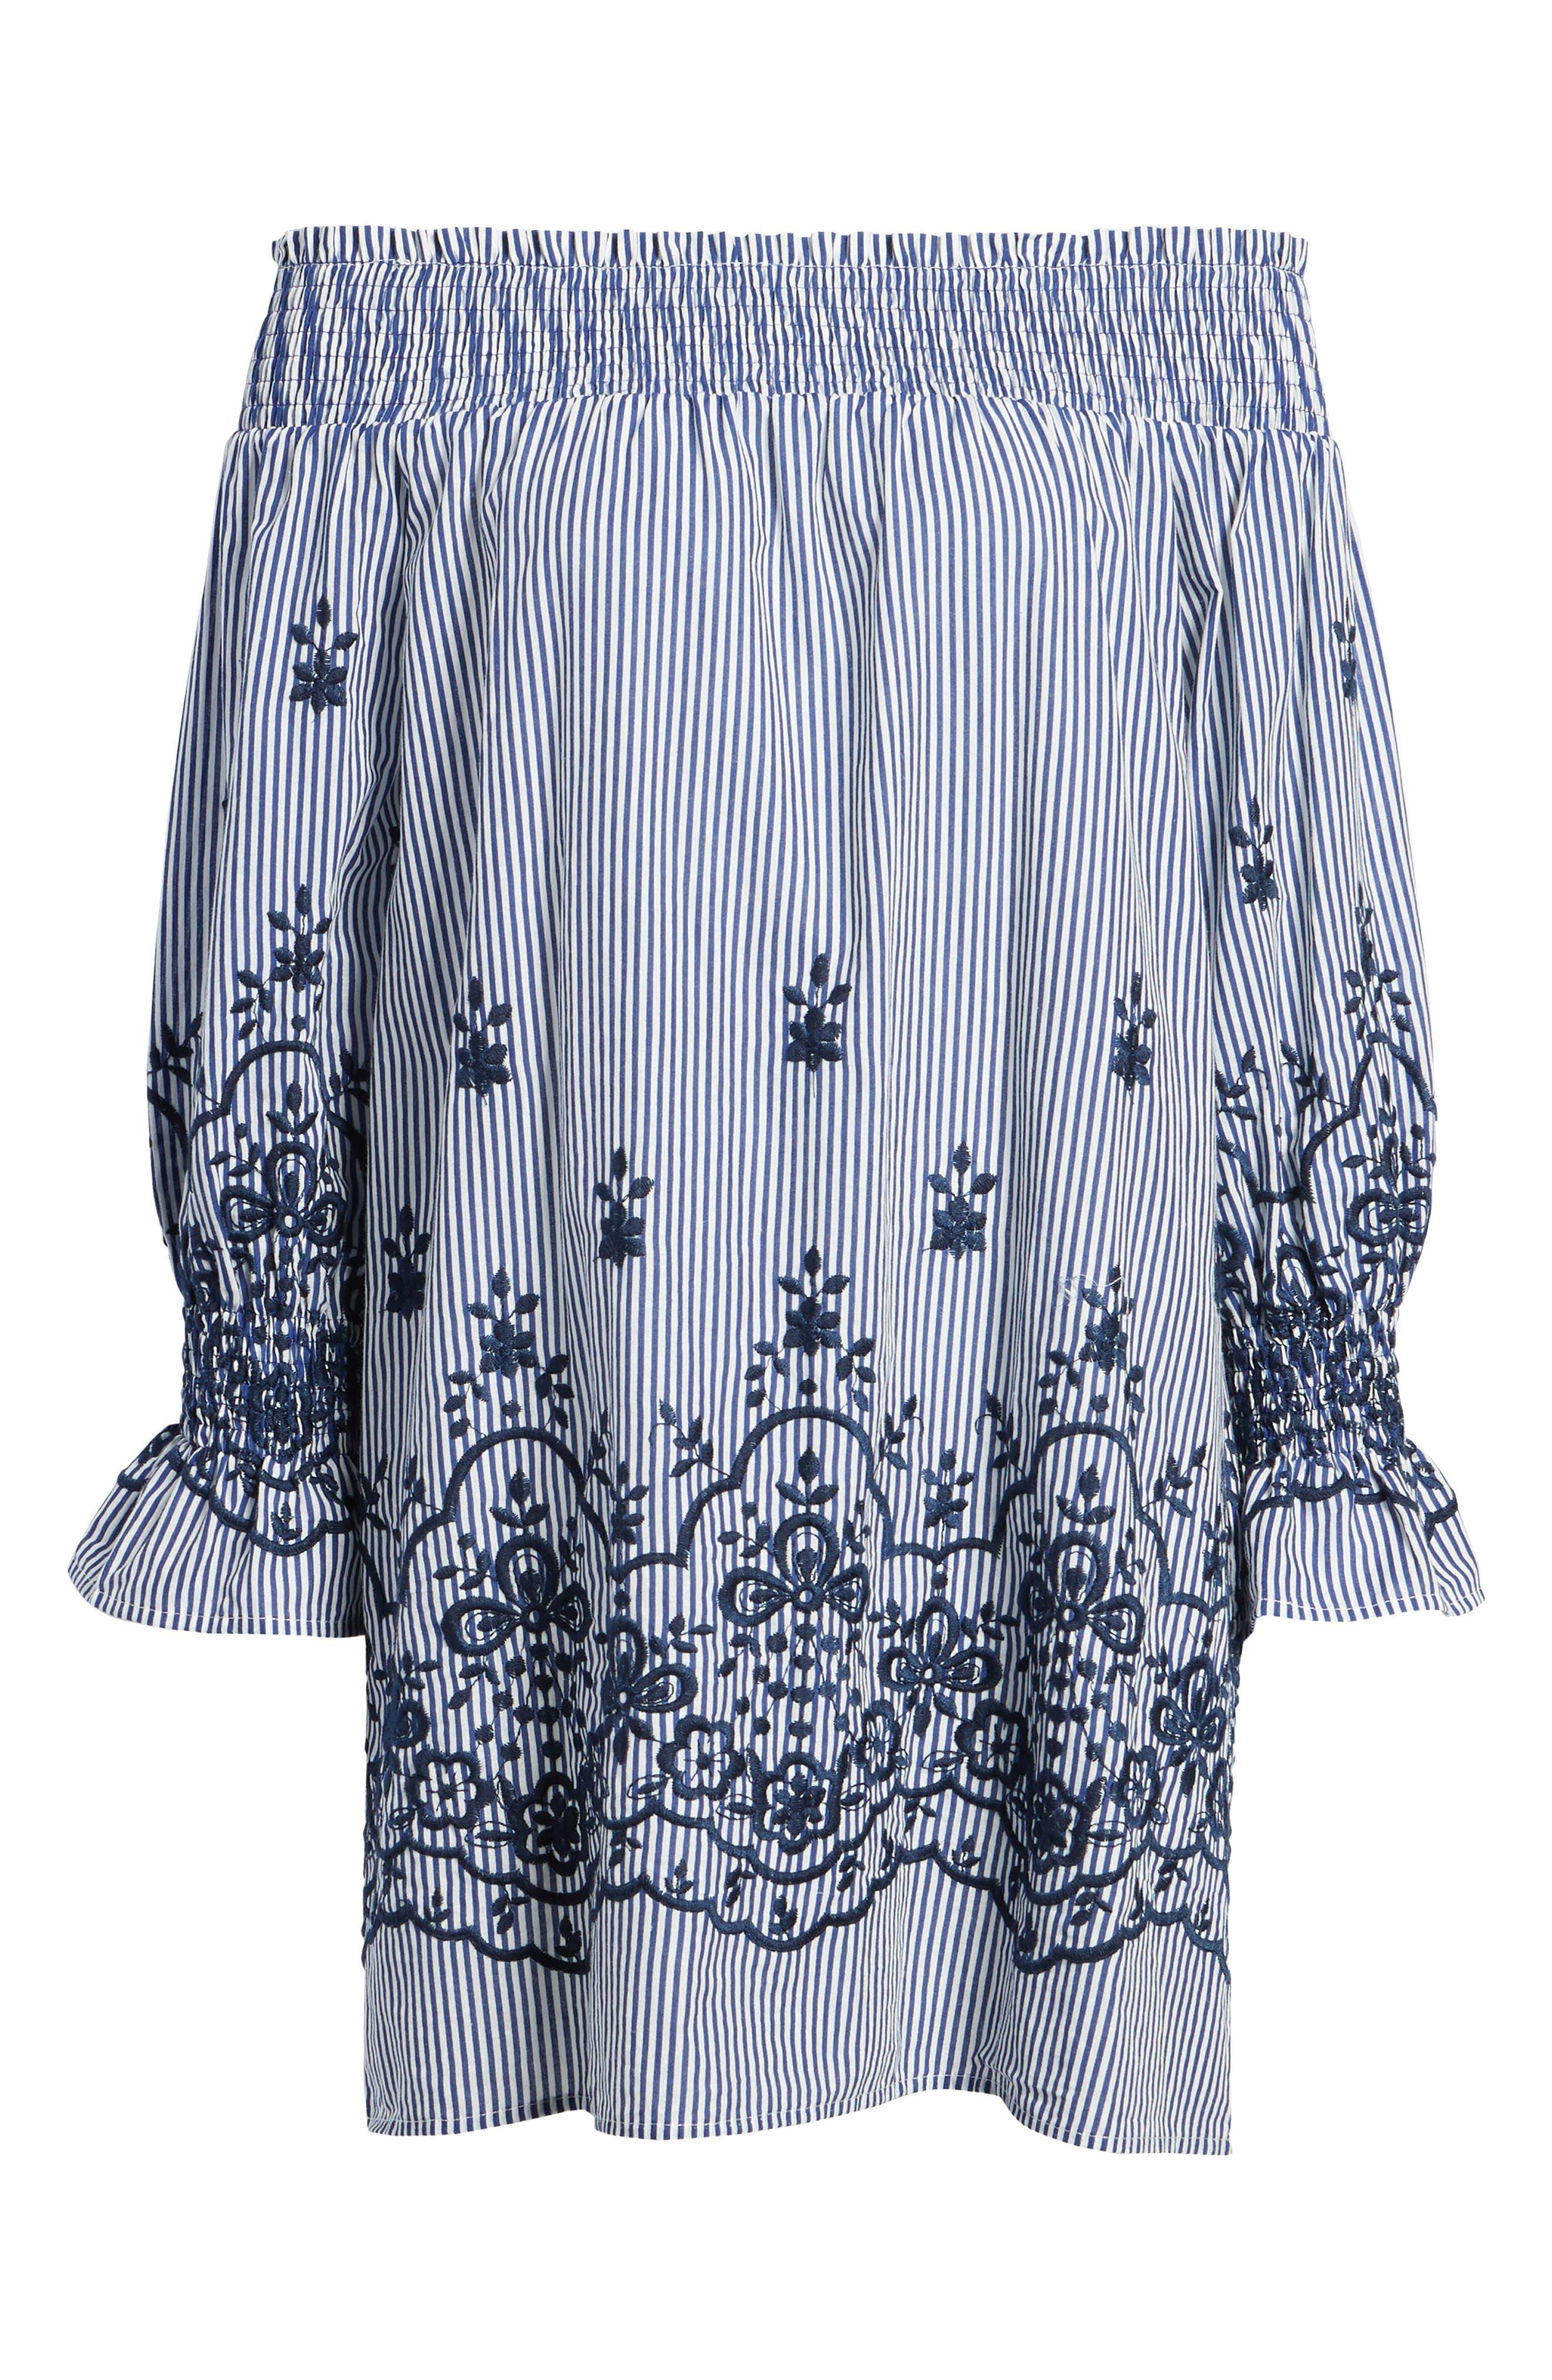 Bishop + Young Stripe Embroidered Off the Shoulder Dress,                             Alternate thumbnail 7, color,